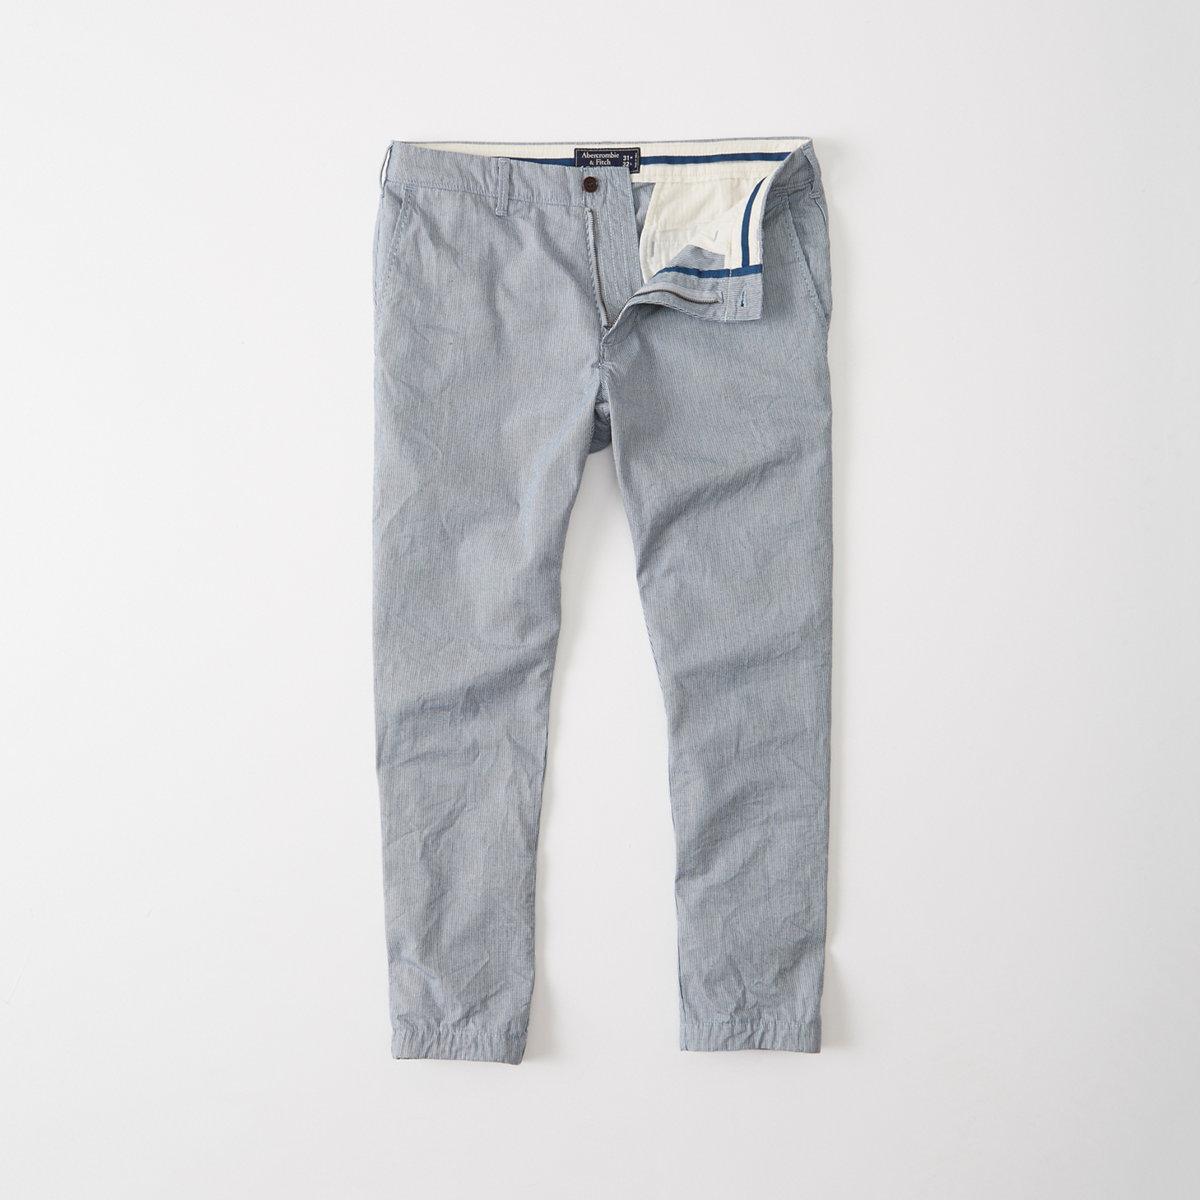 Indigo Cropped Chino Pants